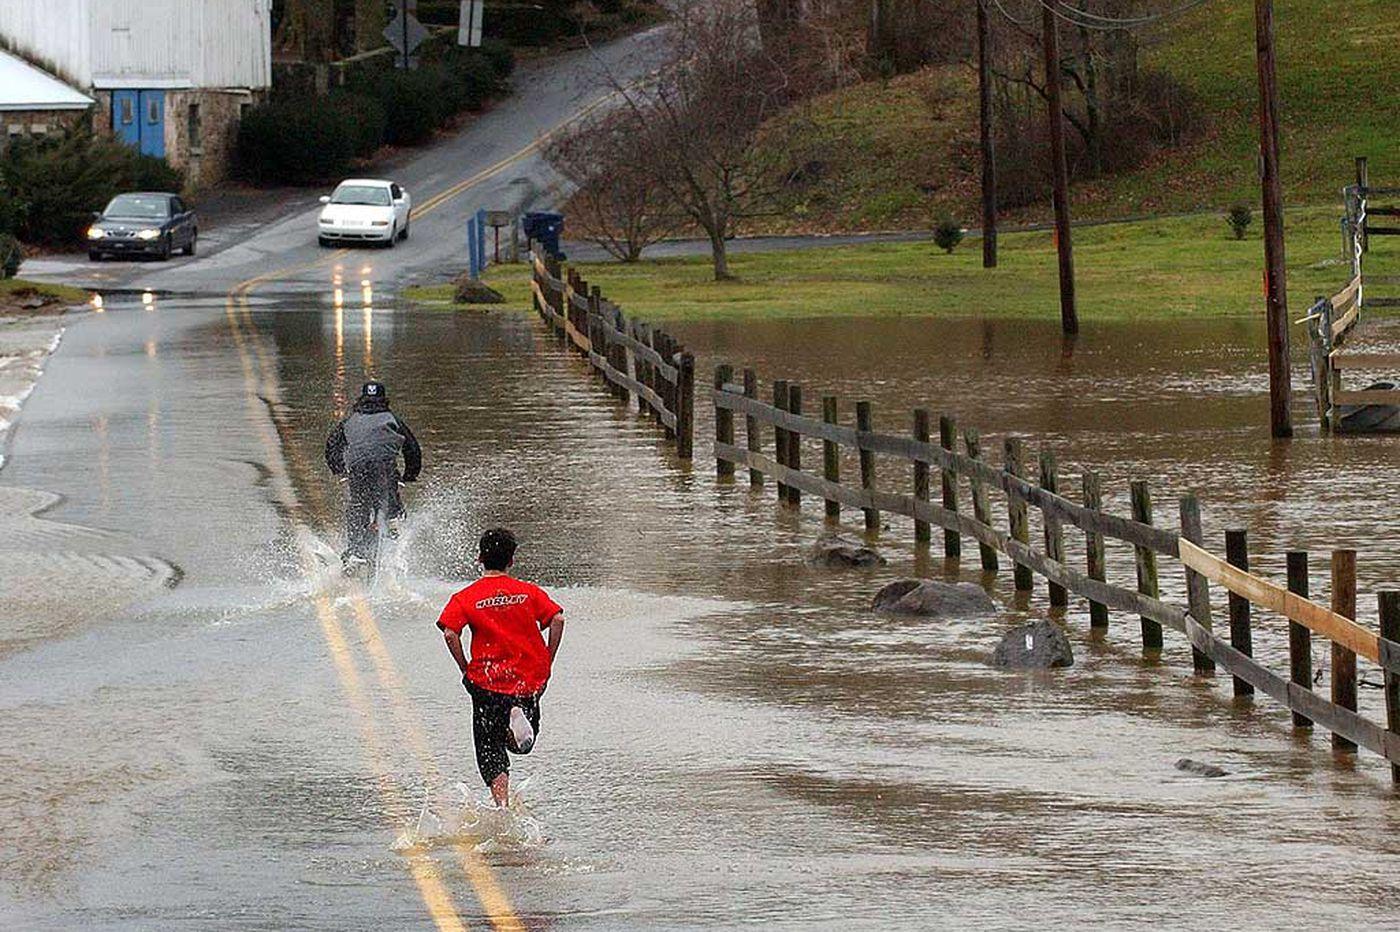 Bill altering buffer zones could threaten clean streams